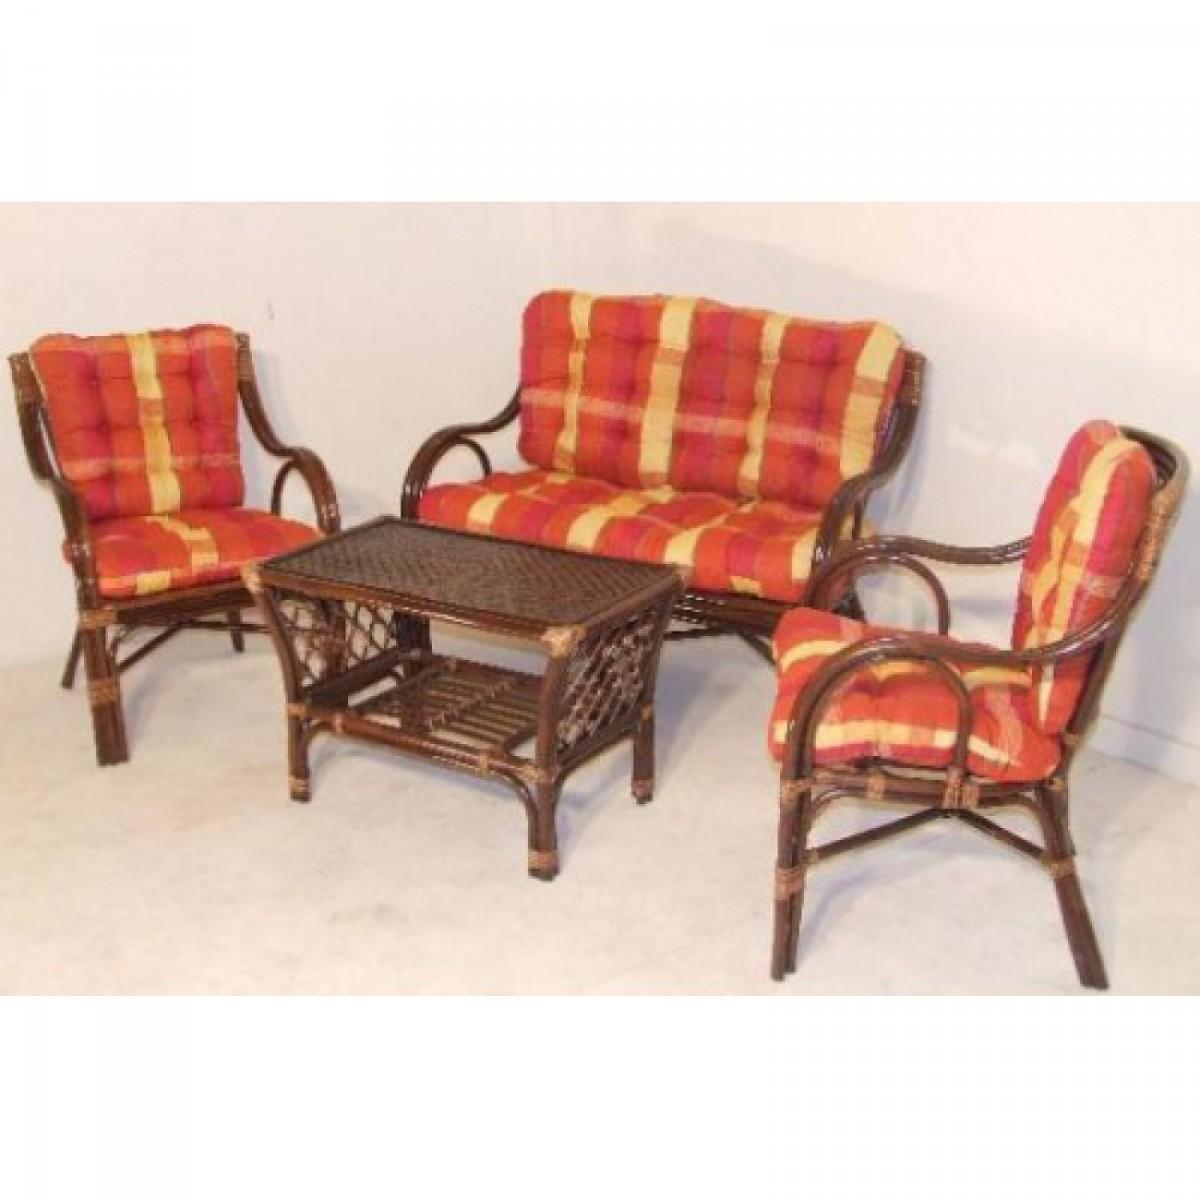 9521b890c Rattan ülőgarnitúra - Asztal+kanapé+2fotel (Bodrum) - barna - Indonéz rattan